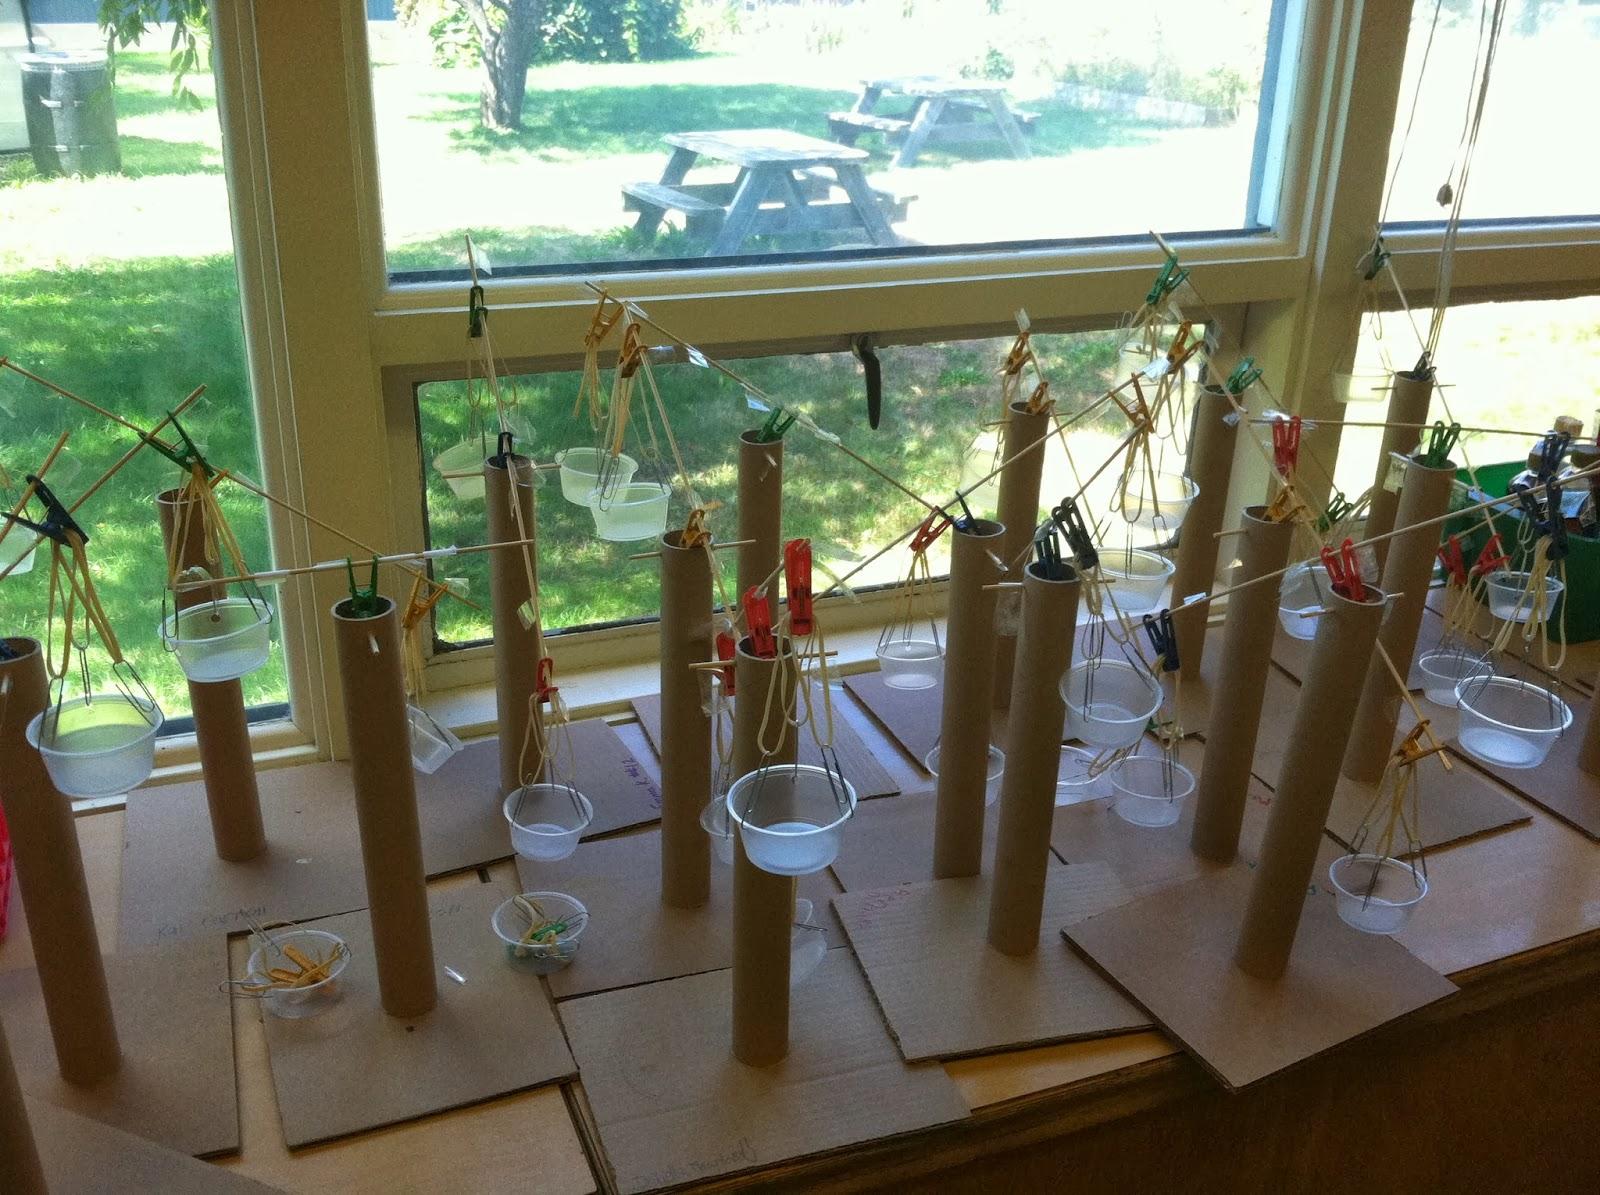 Essex Elementary School Principal's Blog: Pan Balances in